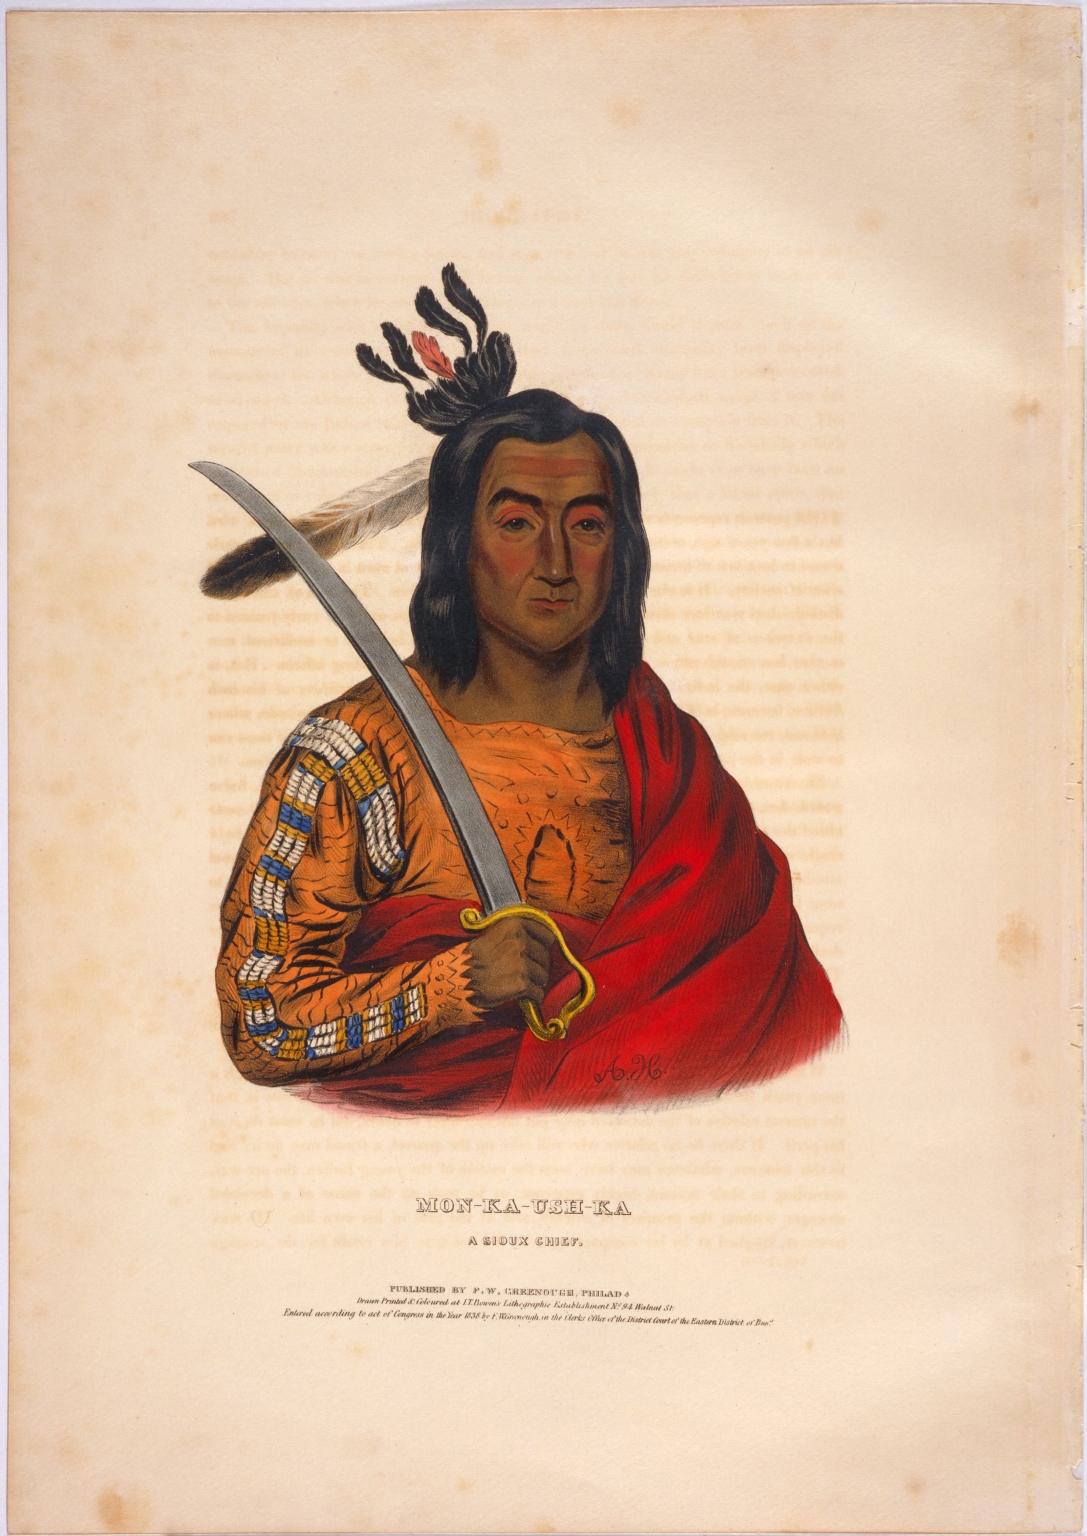 Mon-ka-ush-ka, a Sioux chief